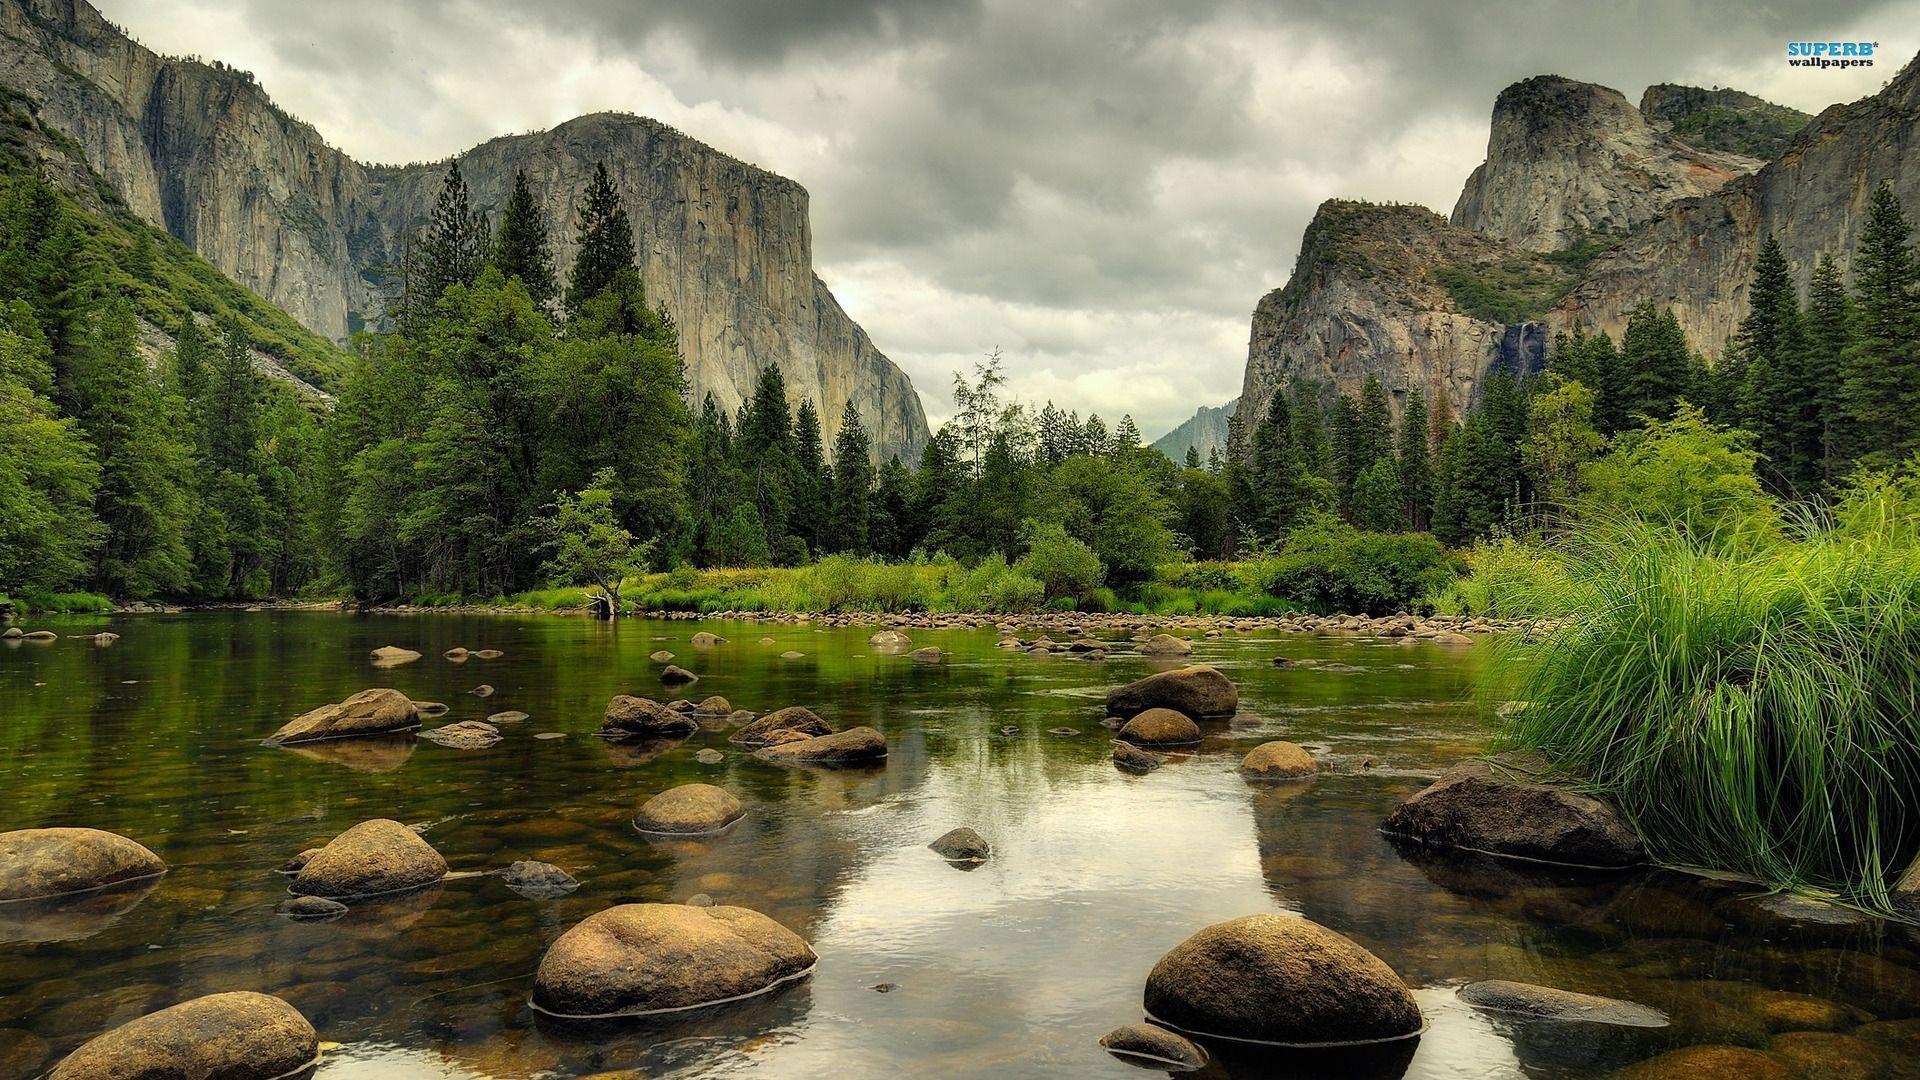 yosemite-national-park-summer - Tiverton Foundation